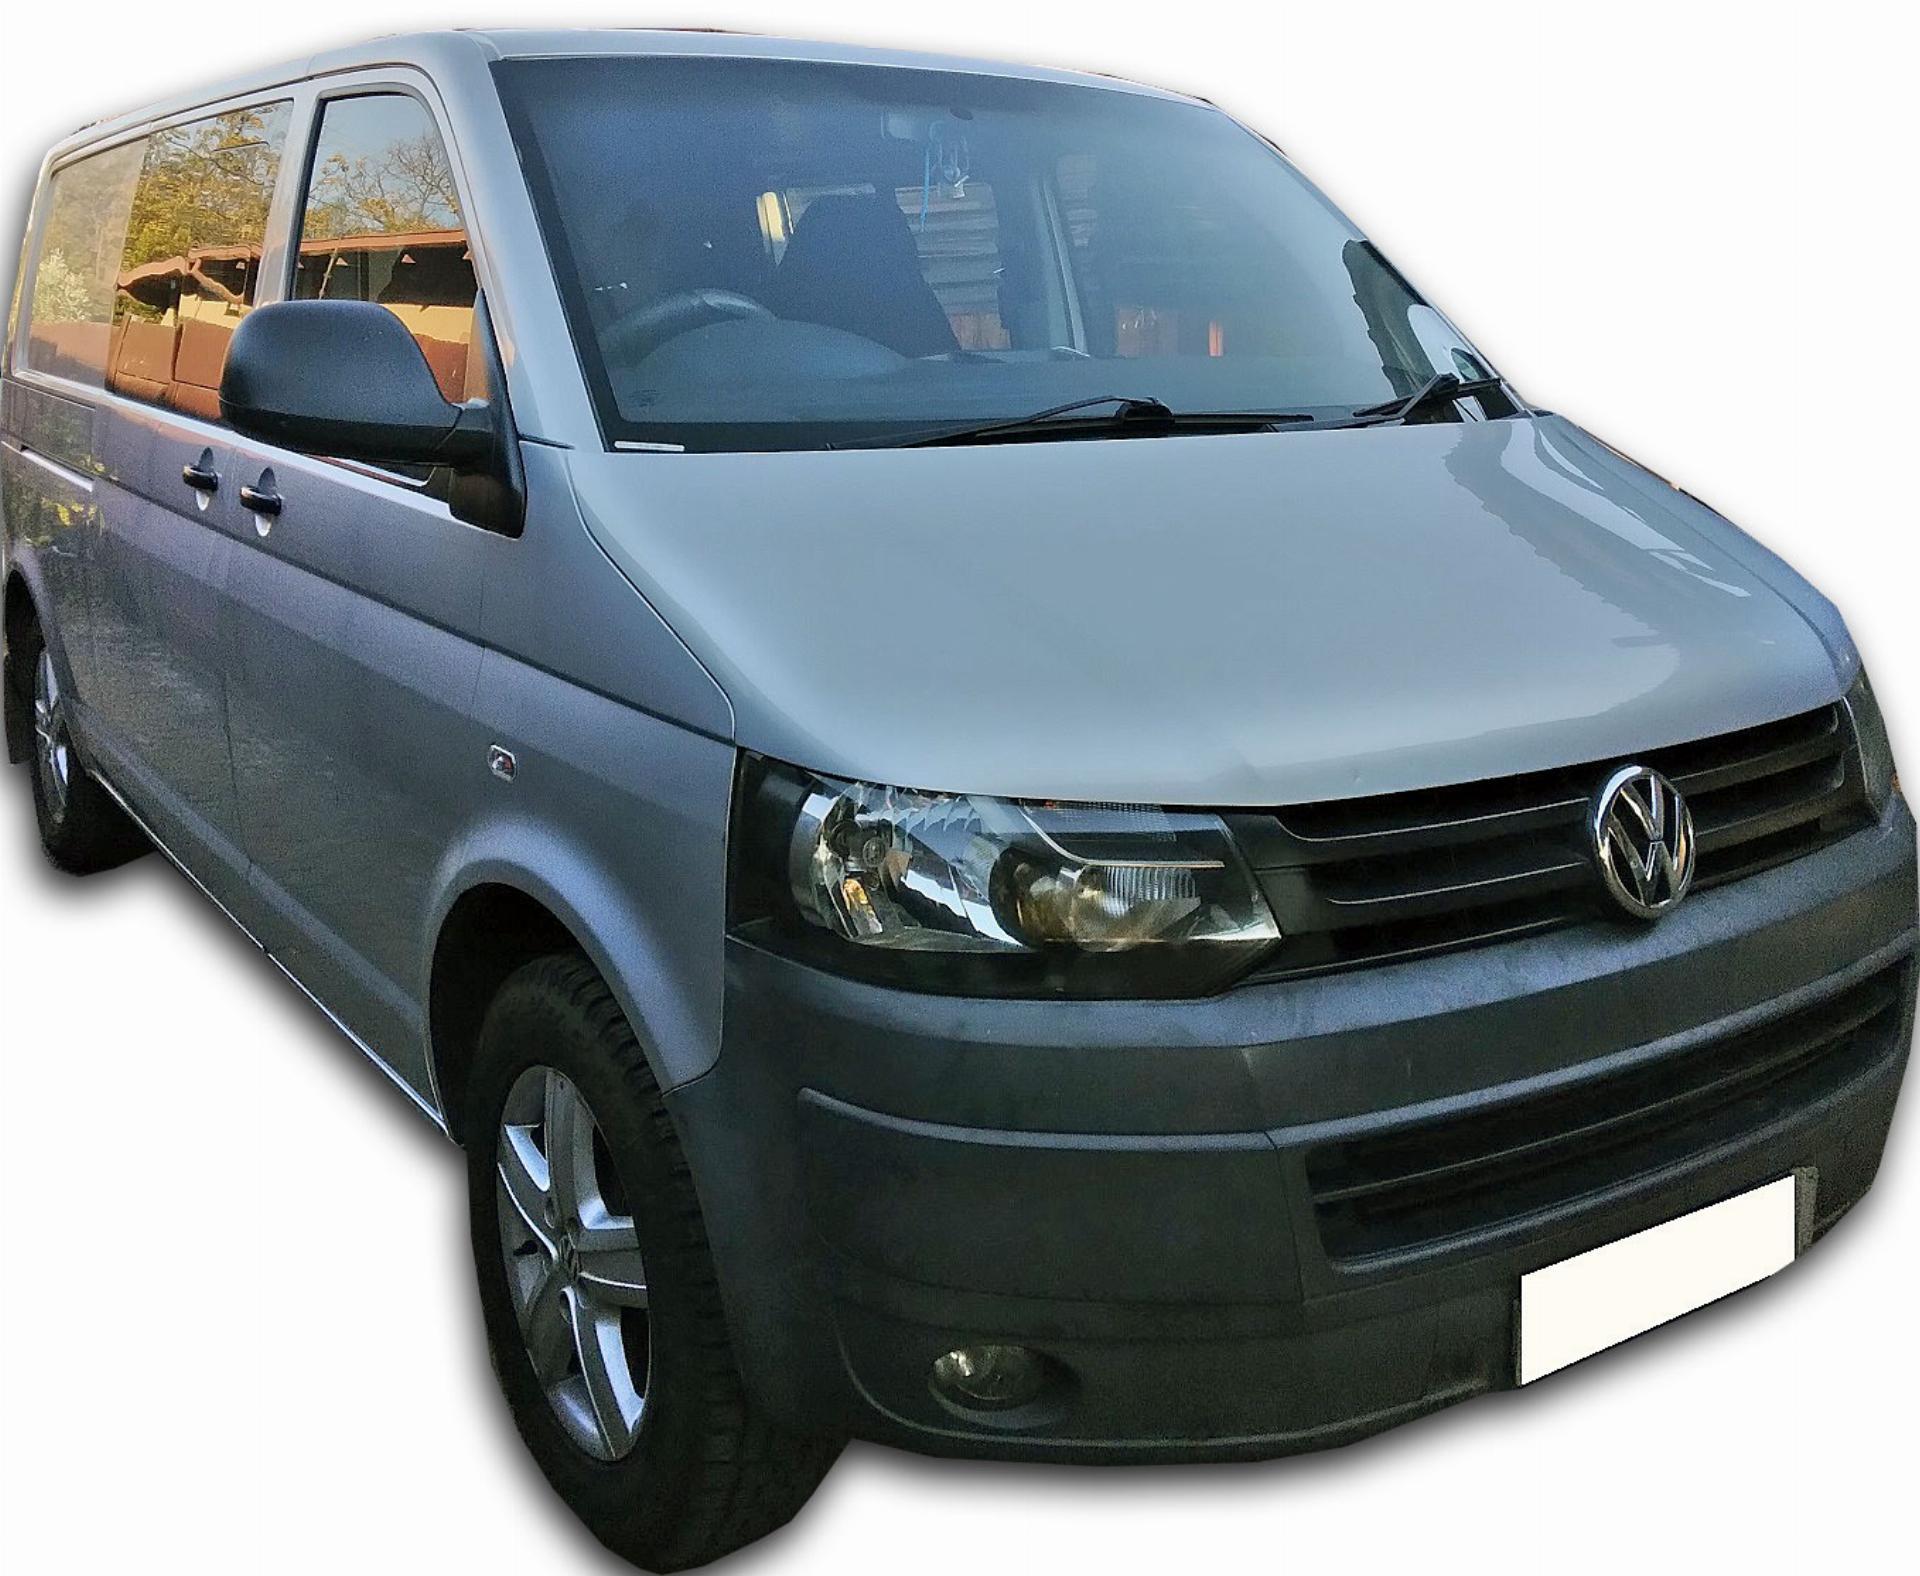 VW Transporter 2.0 Bitd 132KW